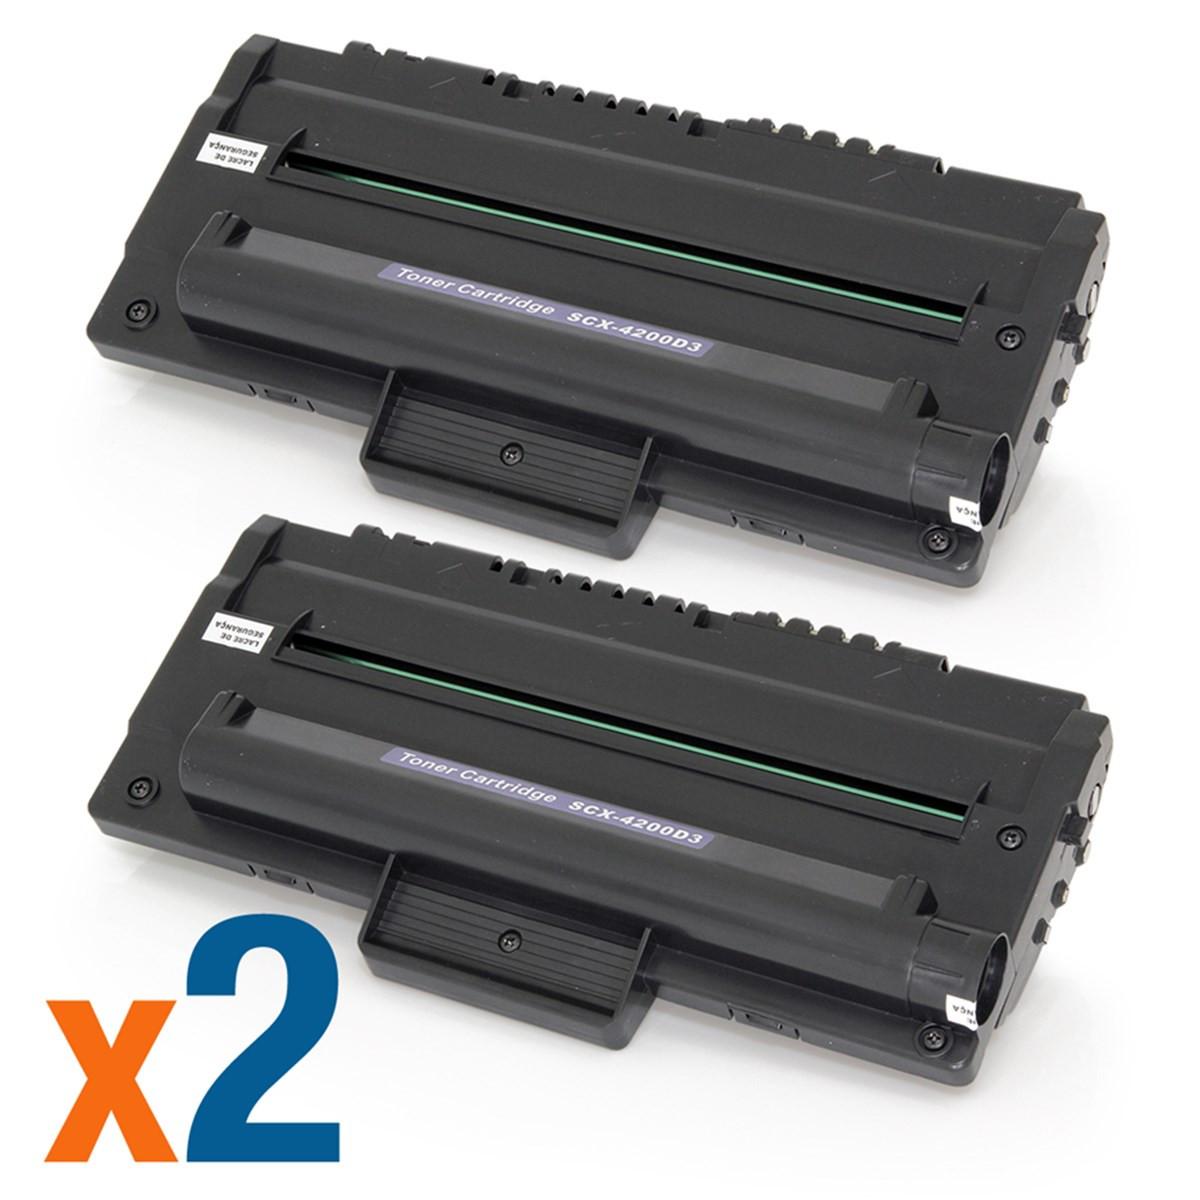 Kit 2 Toner Compatível com Samsung SCX-D4200D3 SCX-D4200A | SCX4200 SCX4220 Premium 3k